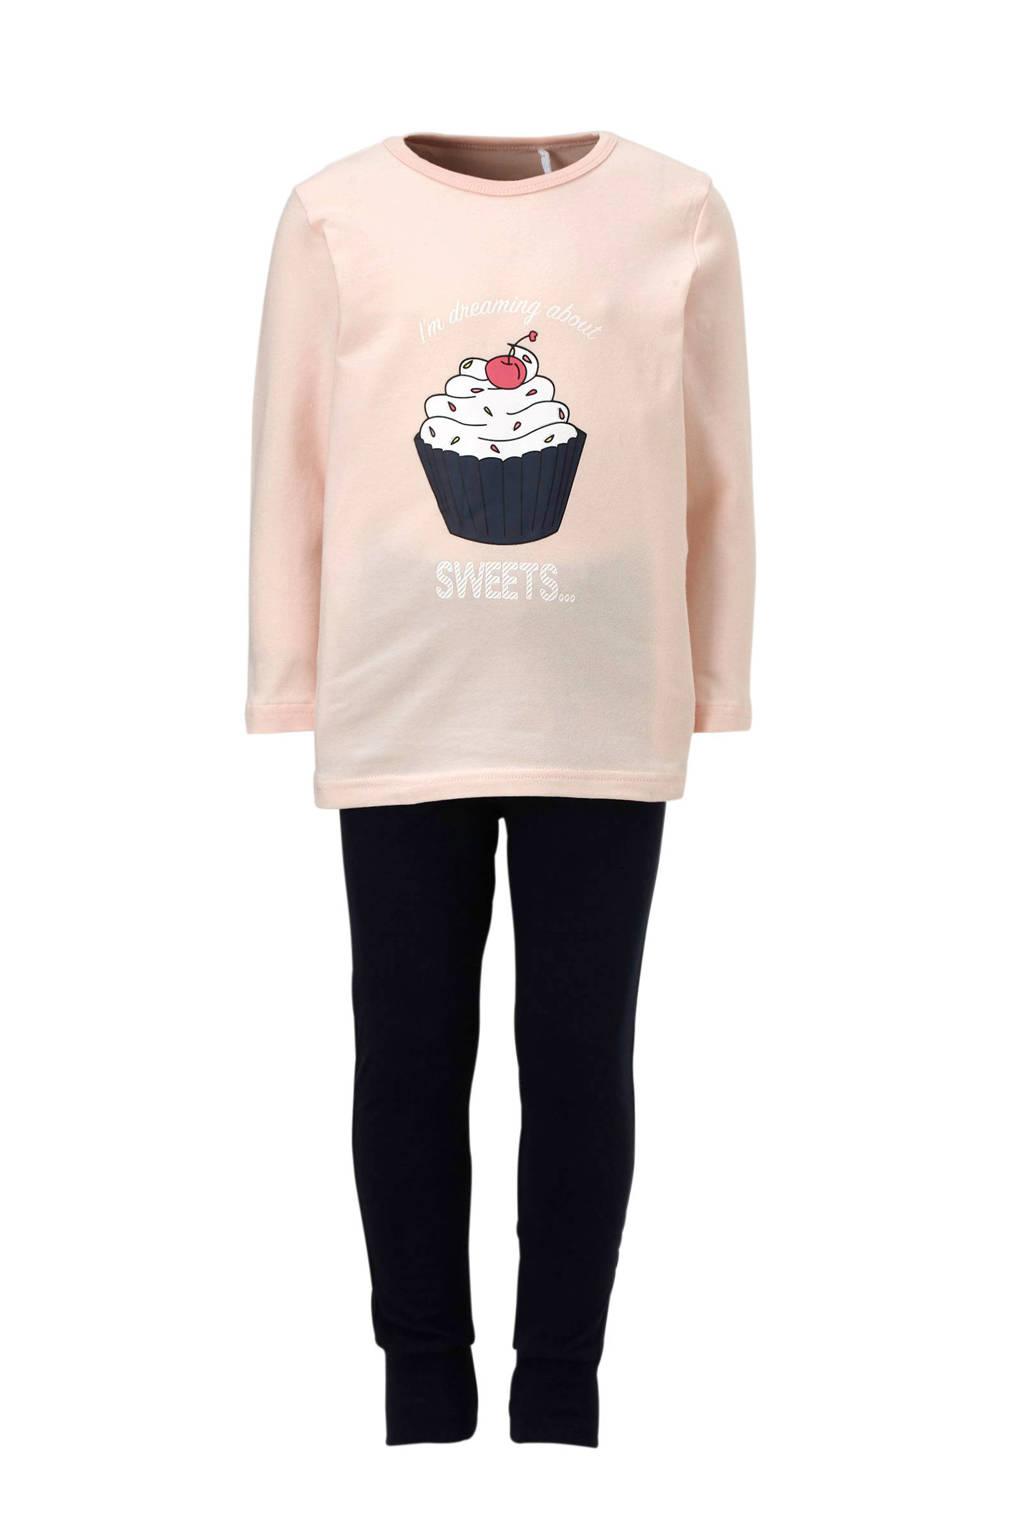 name it MINI pyjama met cupcake roze, Lichtroze/blauw